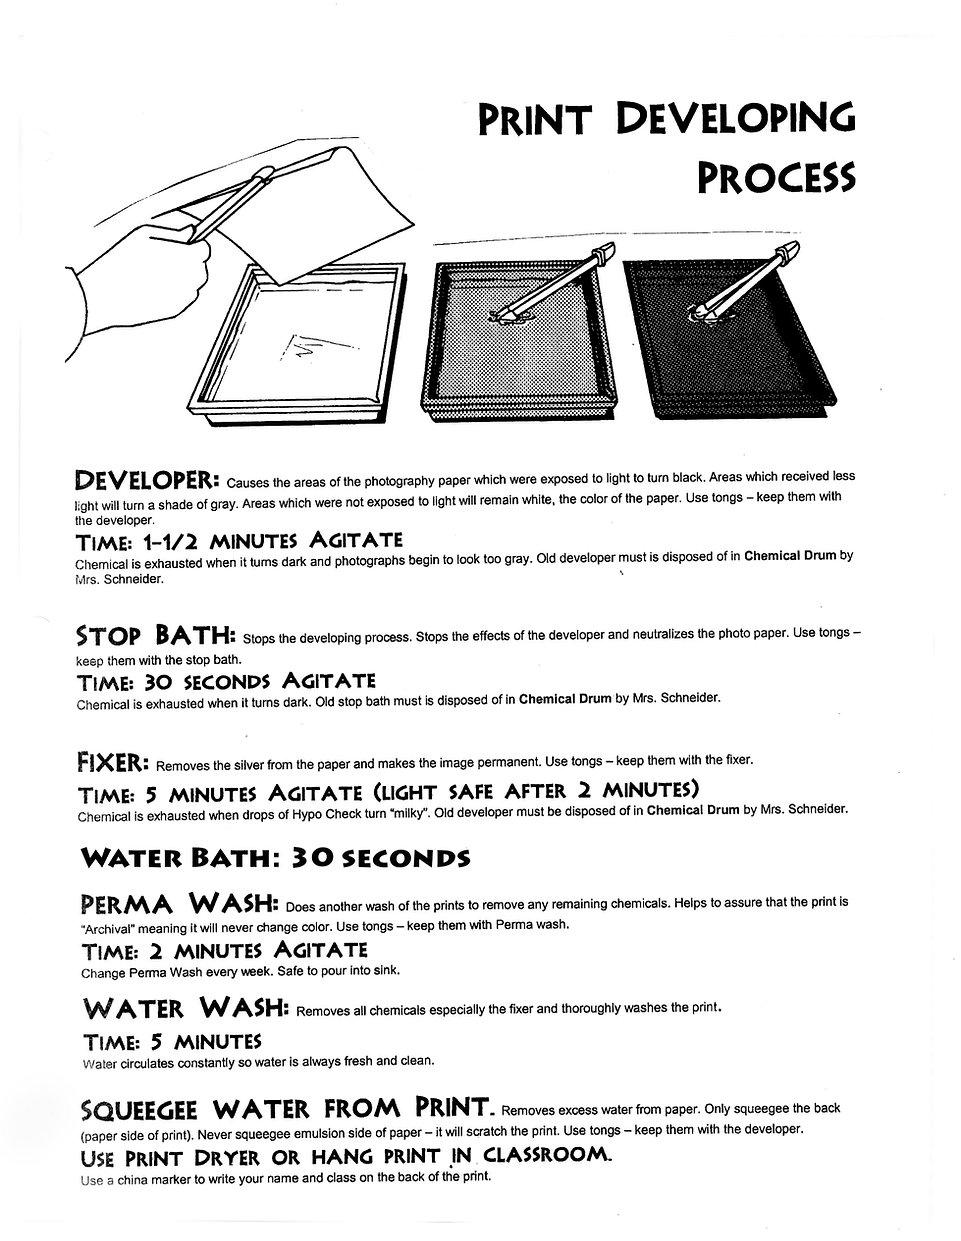 chemistry-processing-rc-edited-permawash